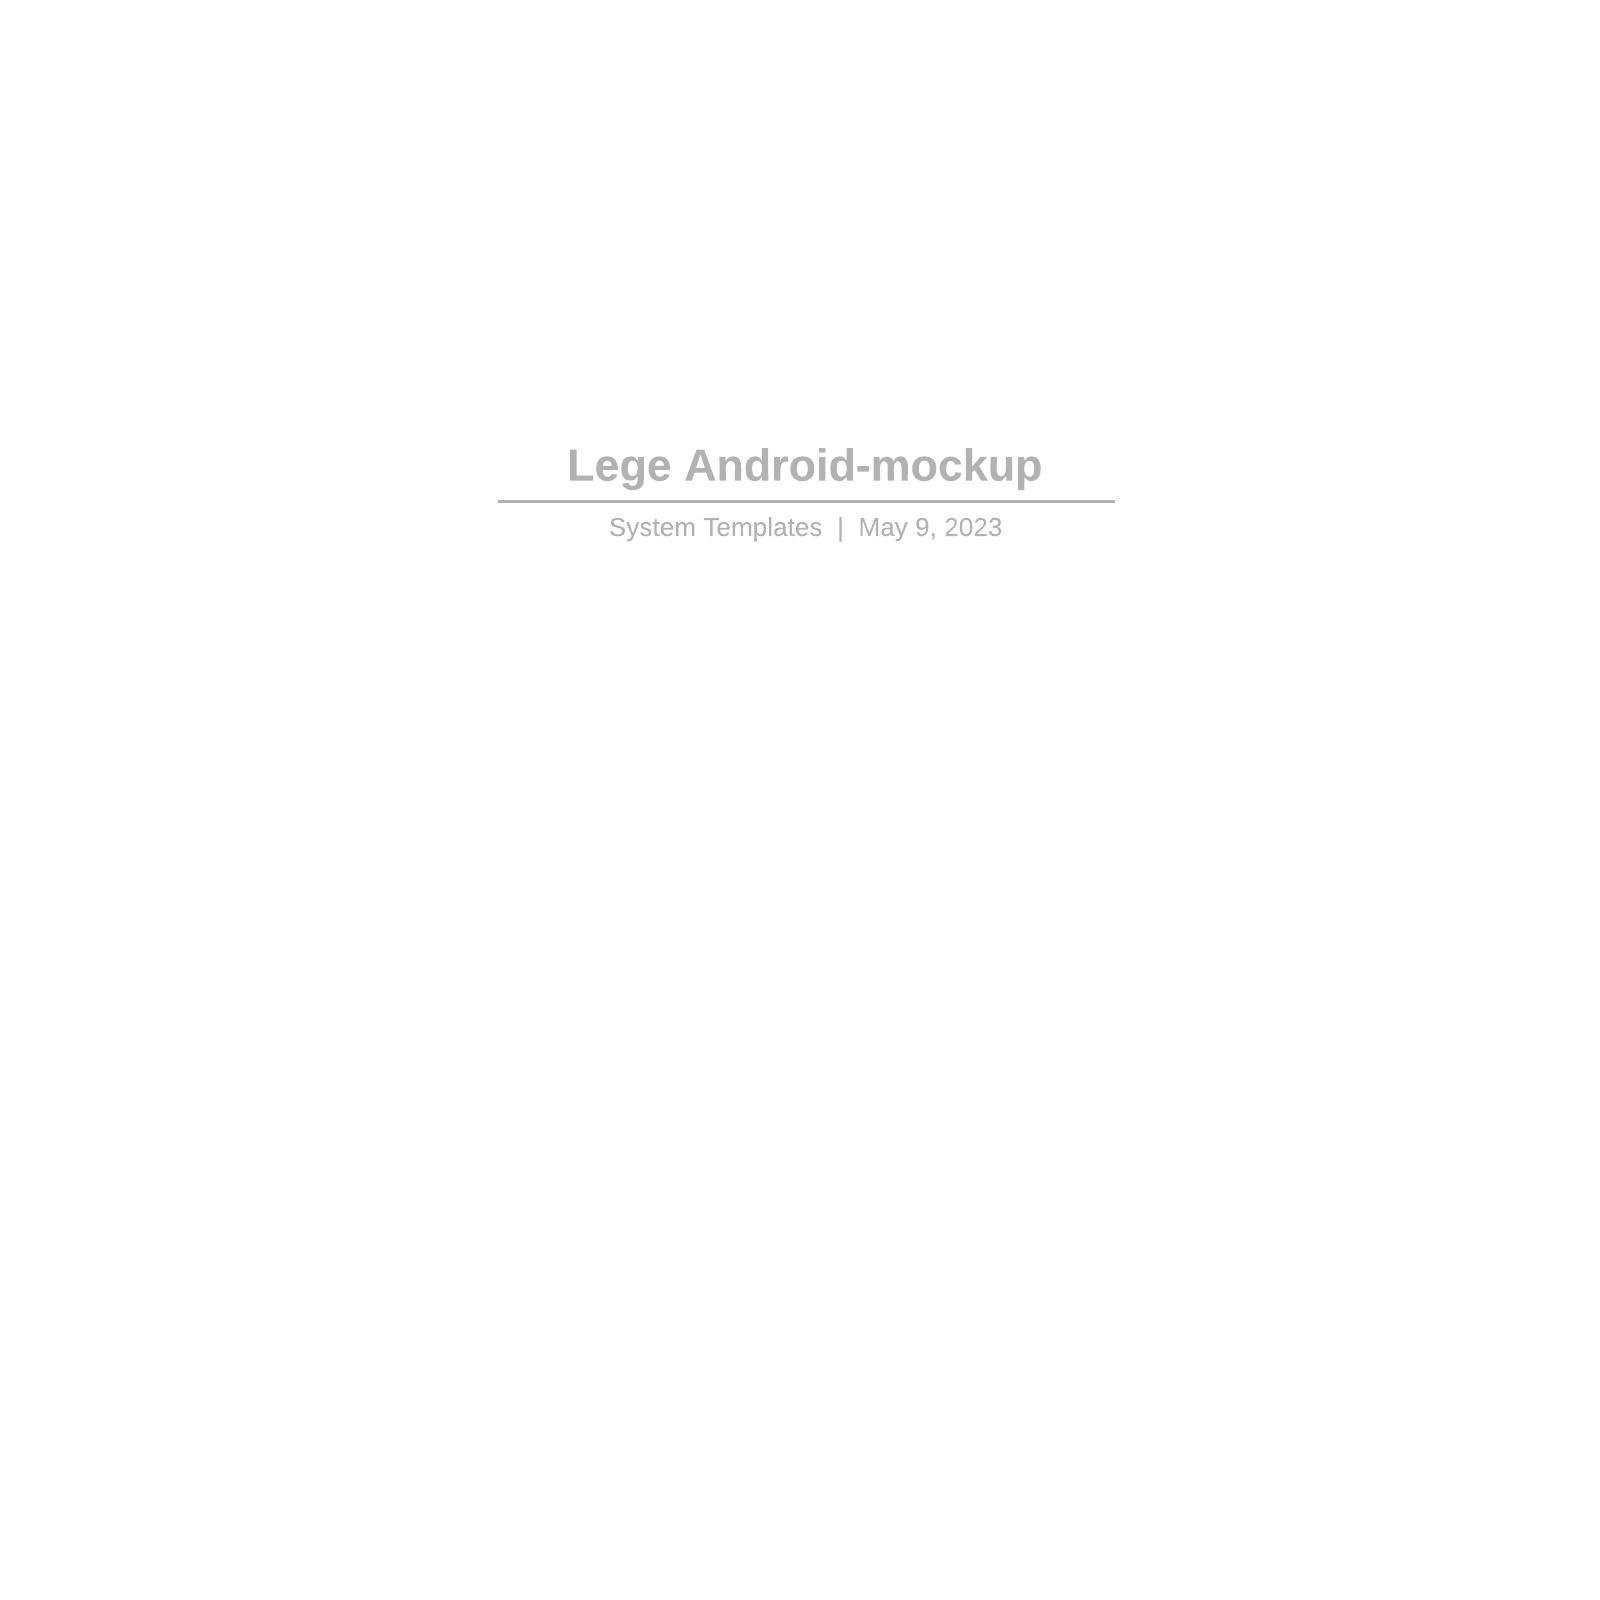 Lege Android-mockup